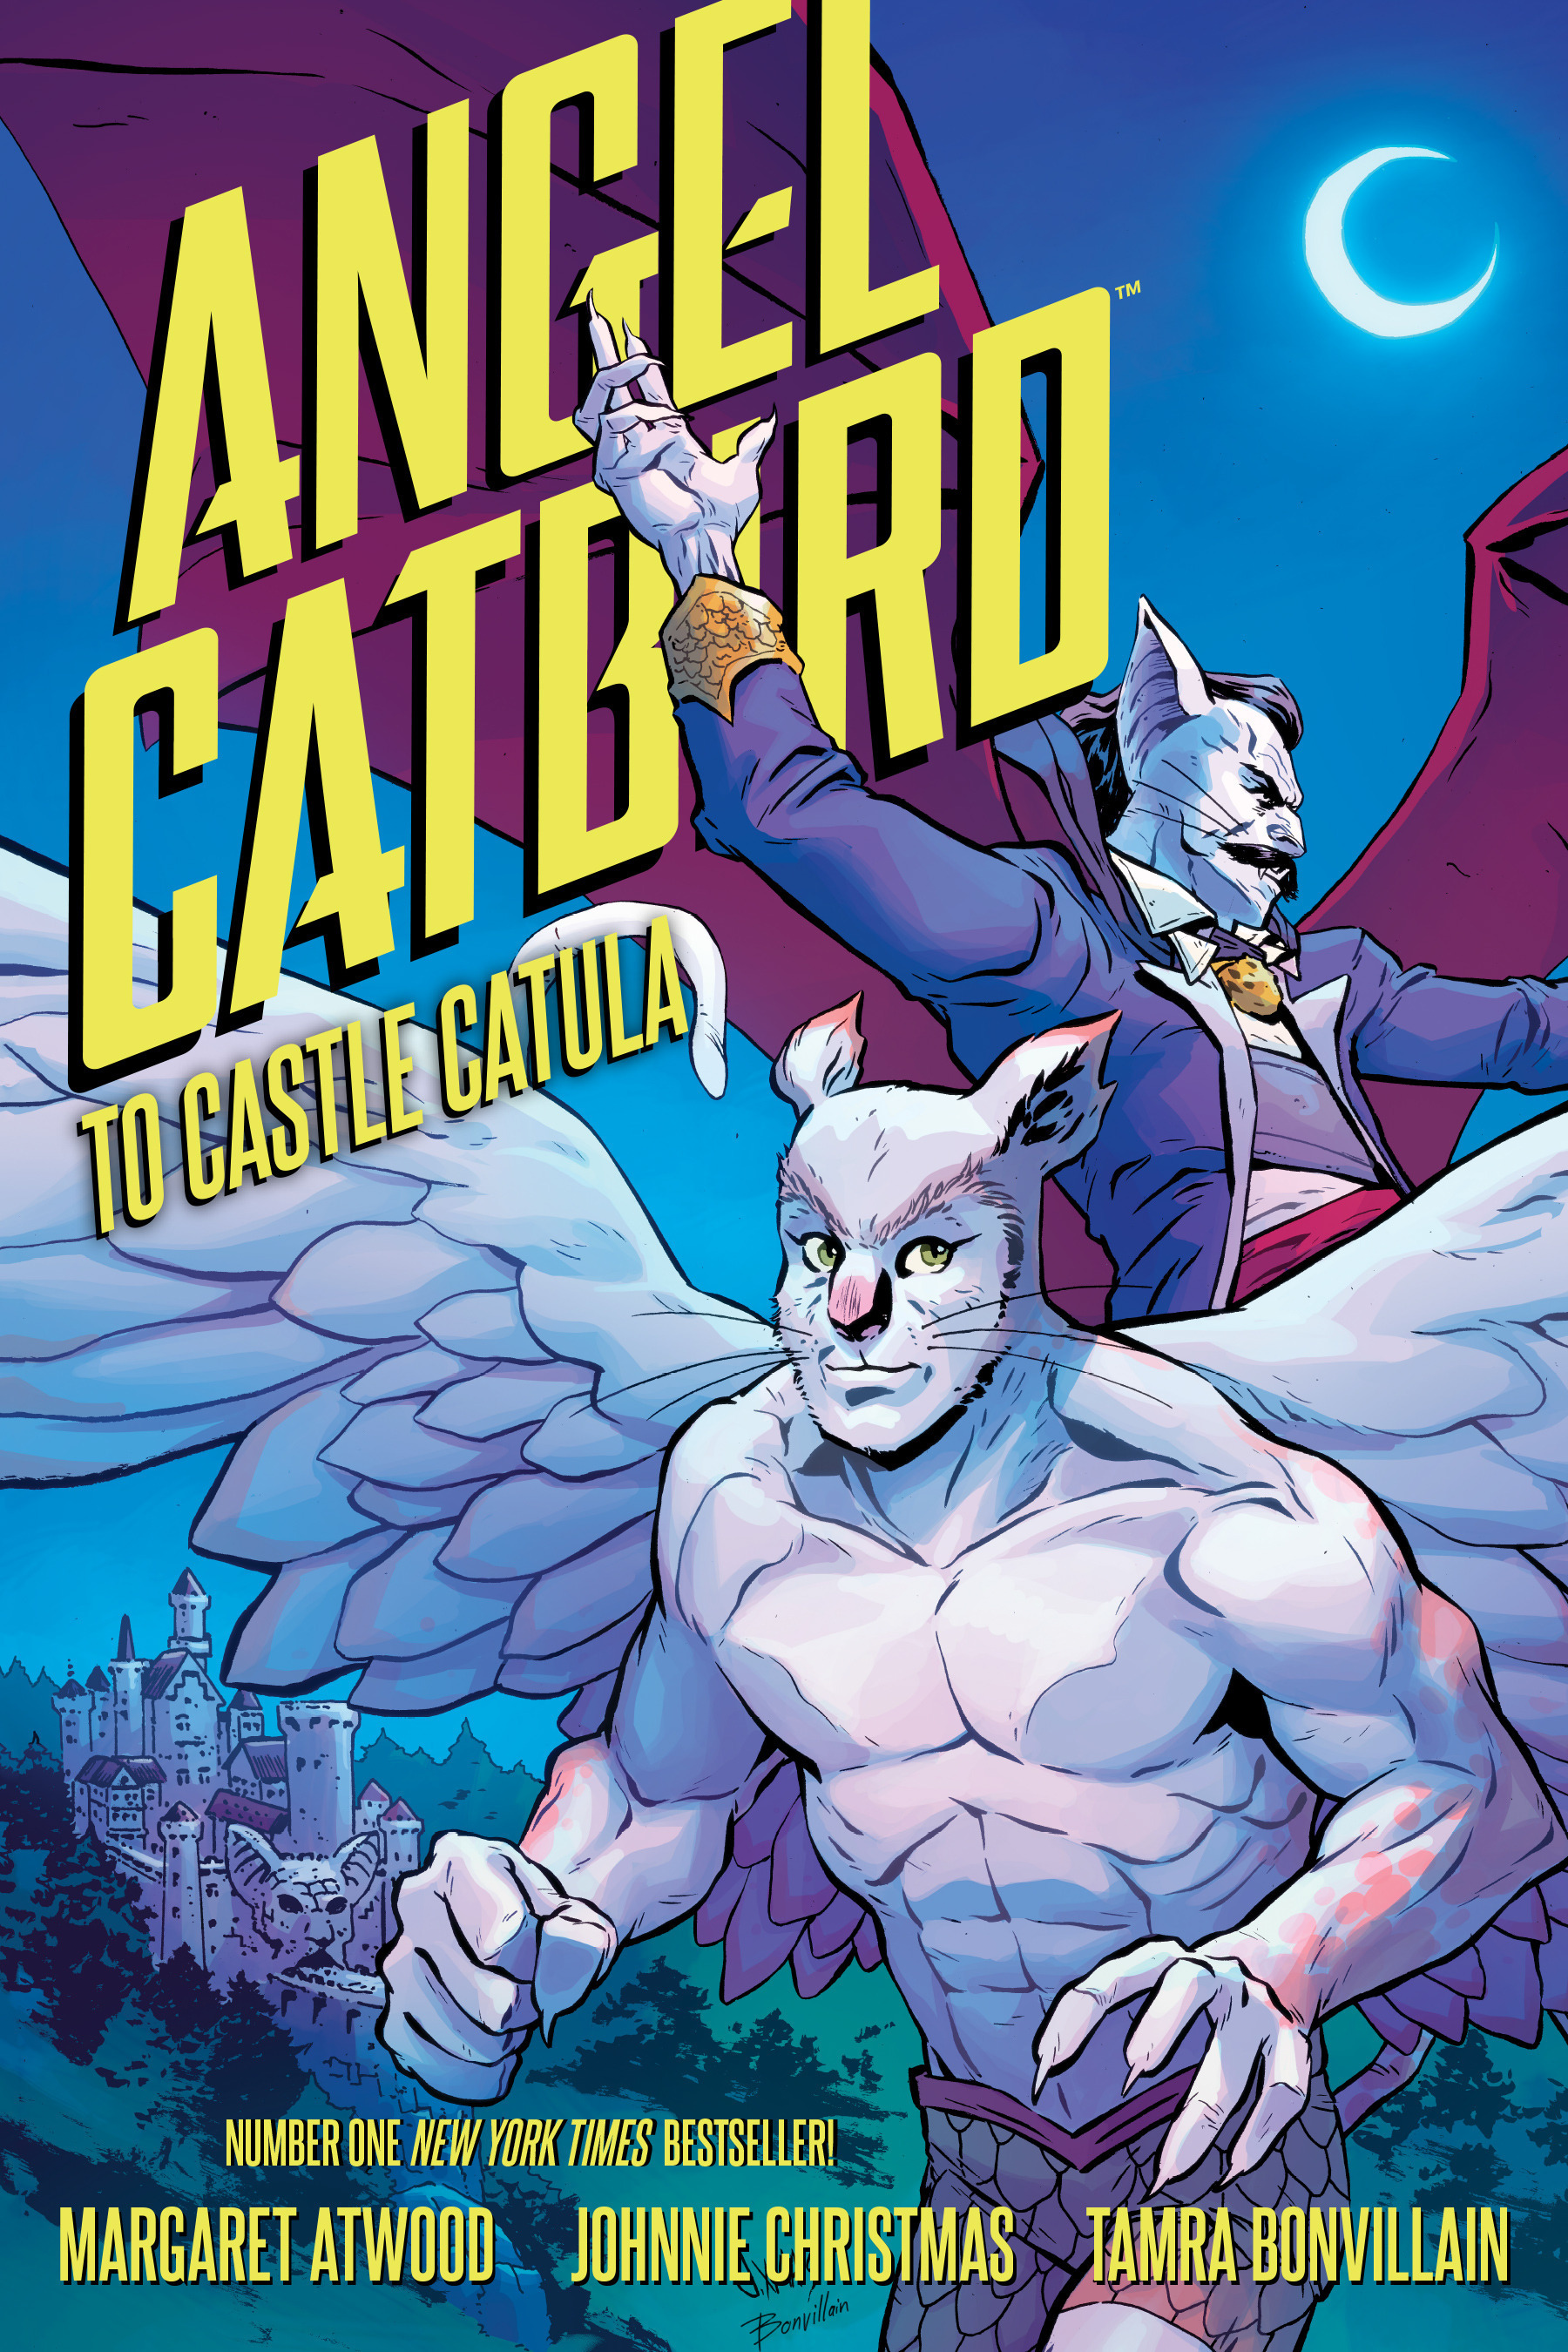 Read online Angel Catbird comic -  Issue # TPB 2 - 1